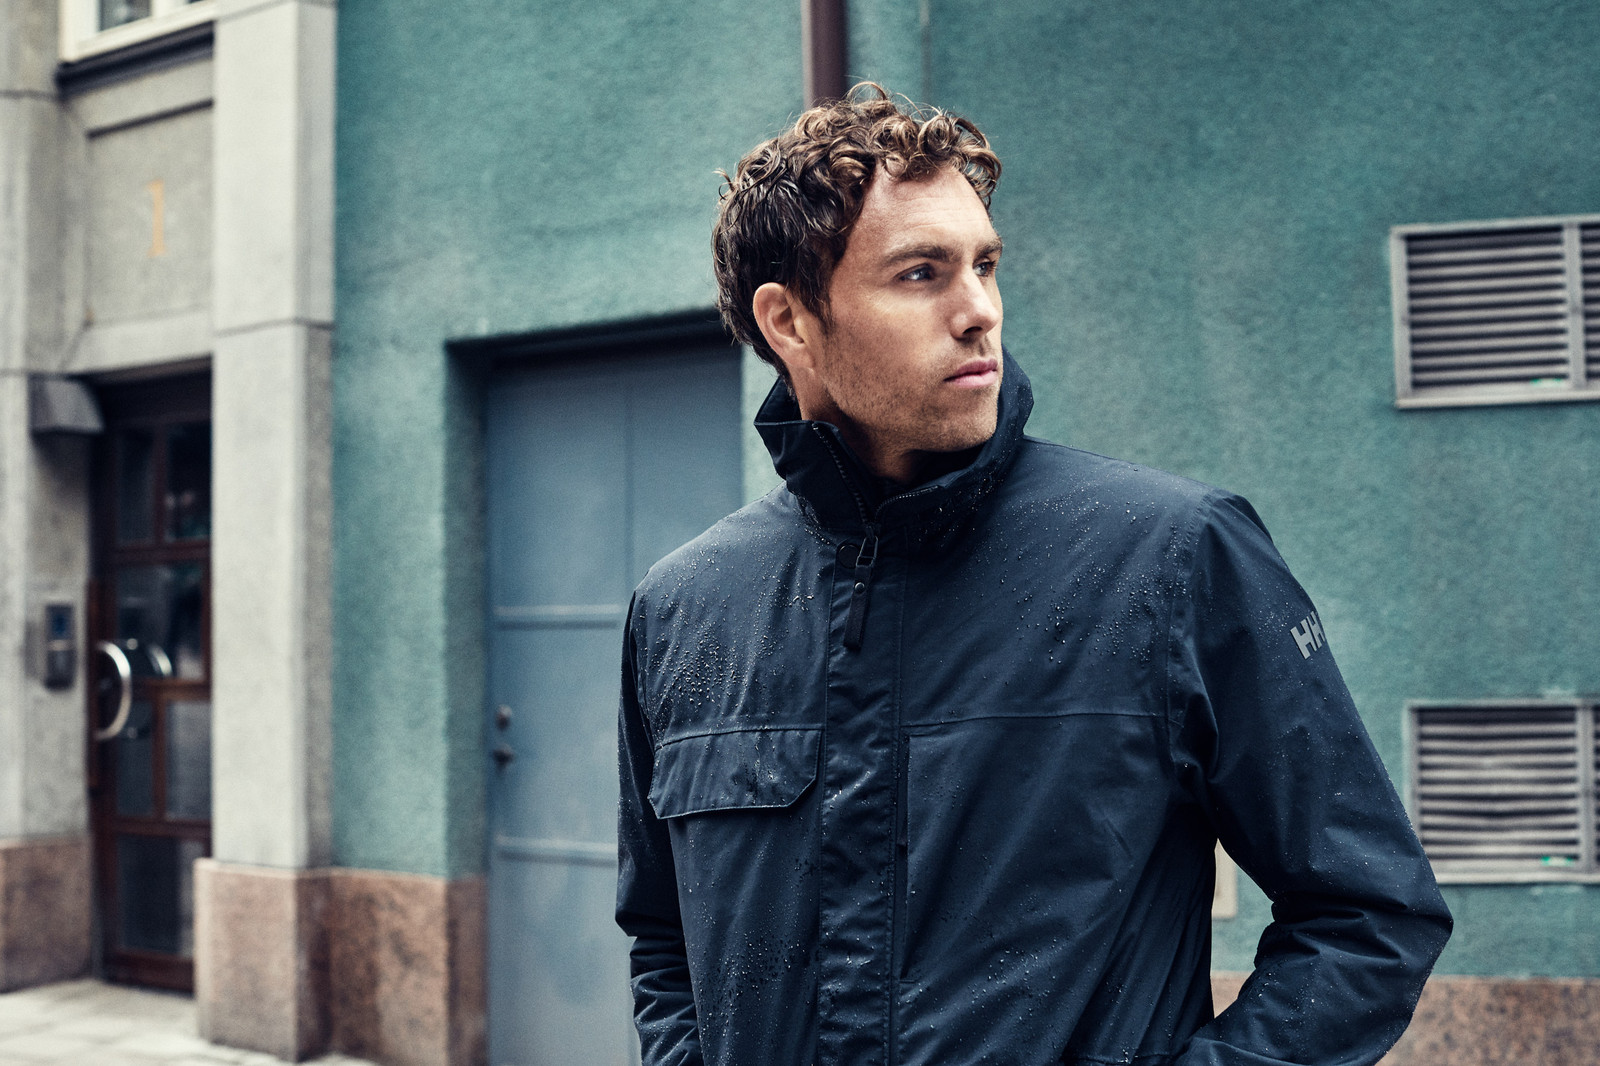 Helly Hansen Utility Rain Jacket, Men's - Black, 53415-990 on model urban lifestyle